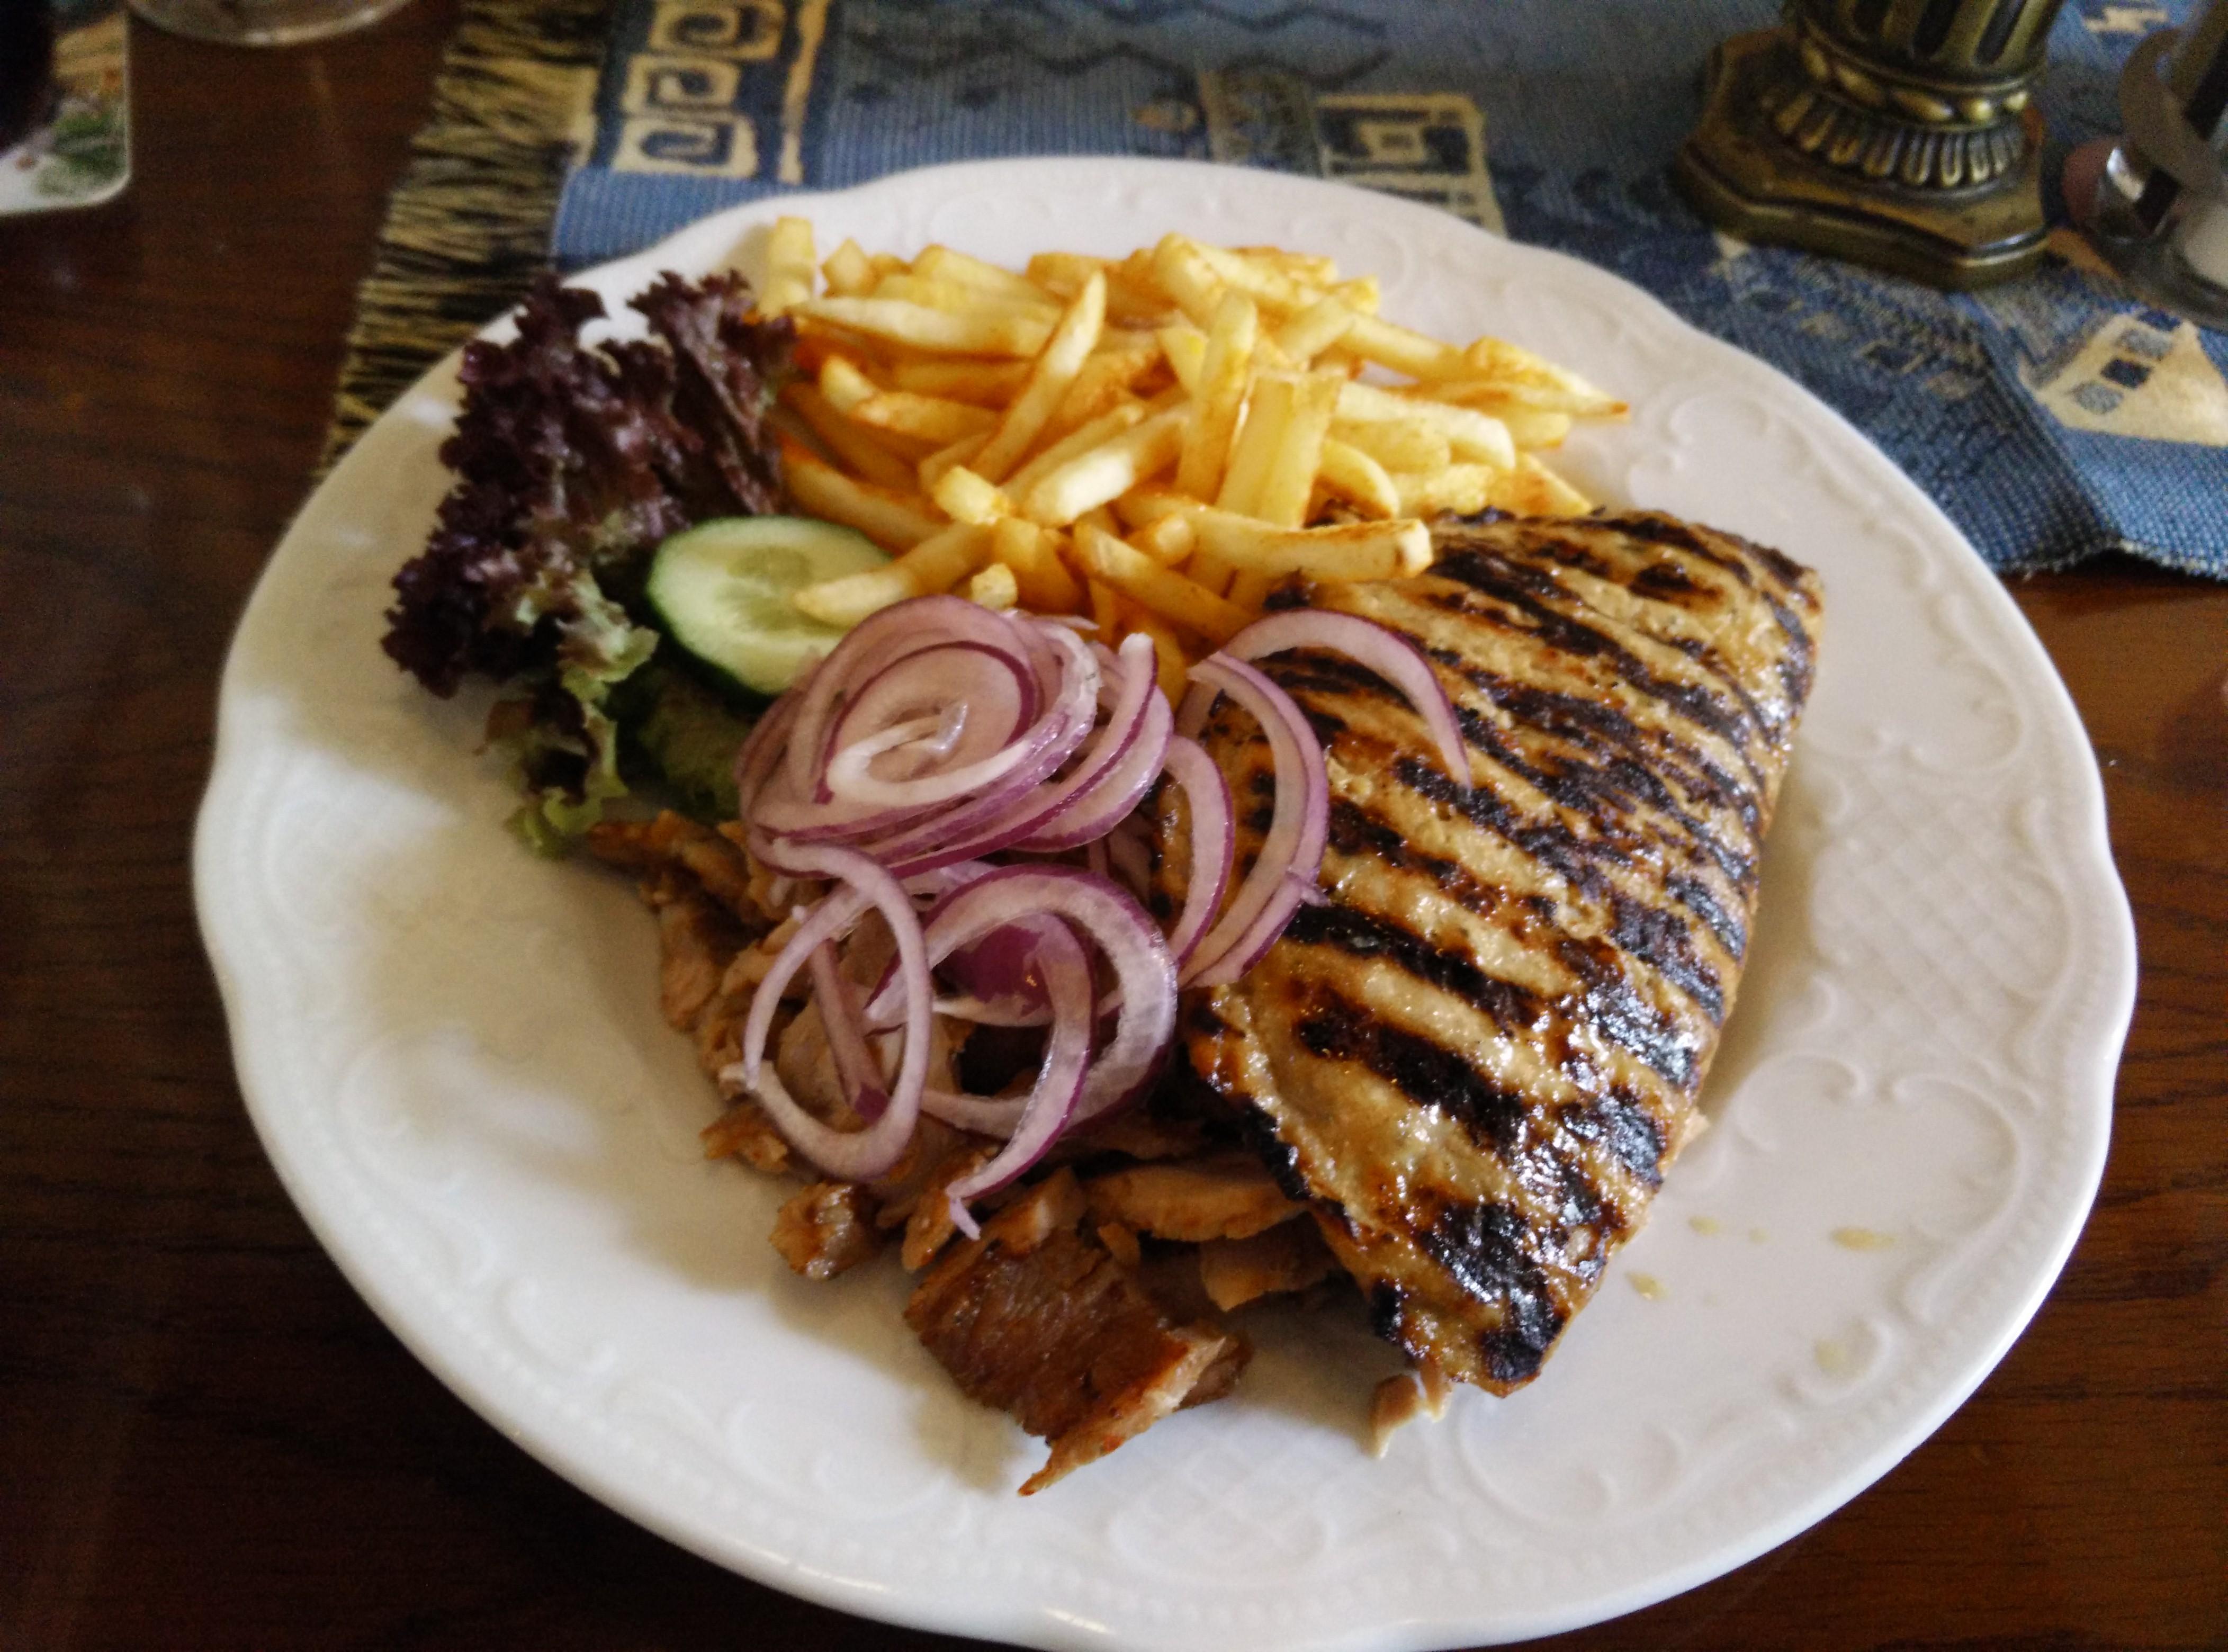 http://foodloader.net/Holz_2015-03-21_Bifteki_mit_Gyros_und_Pommes.jpg